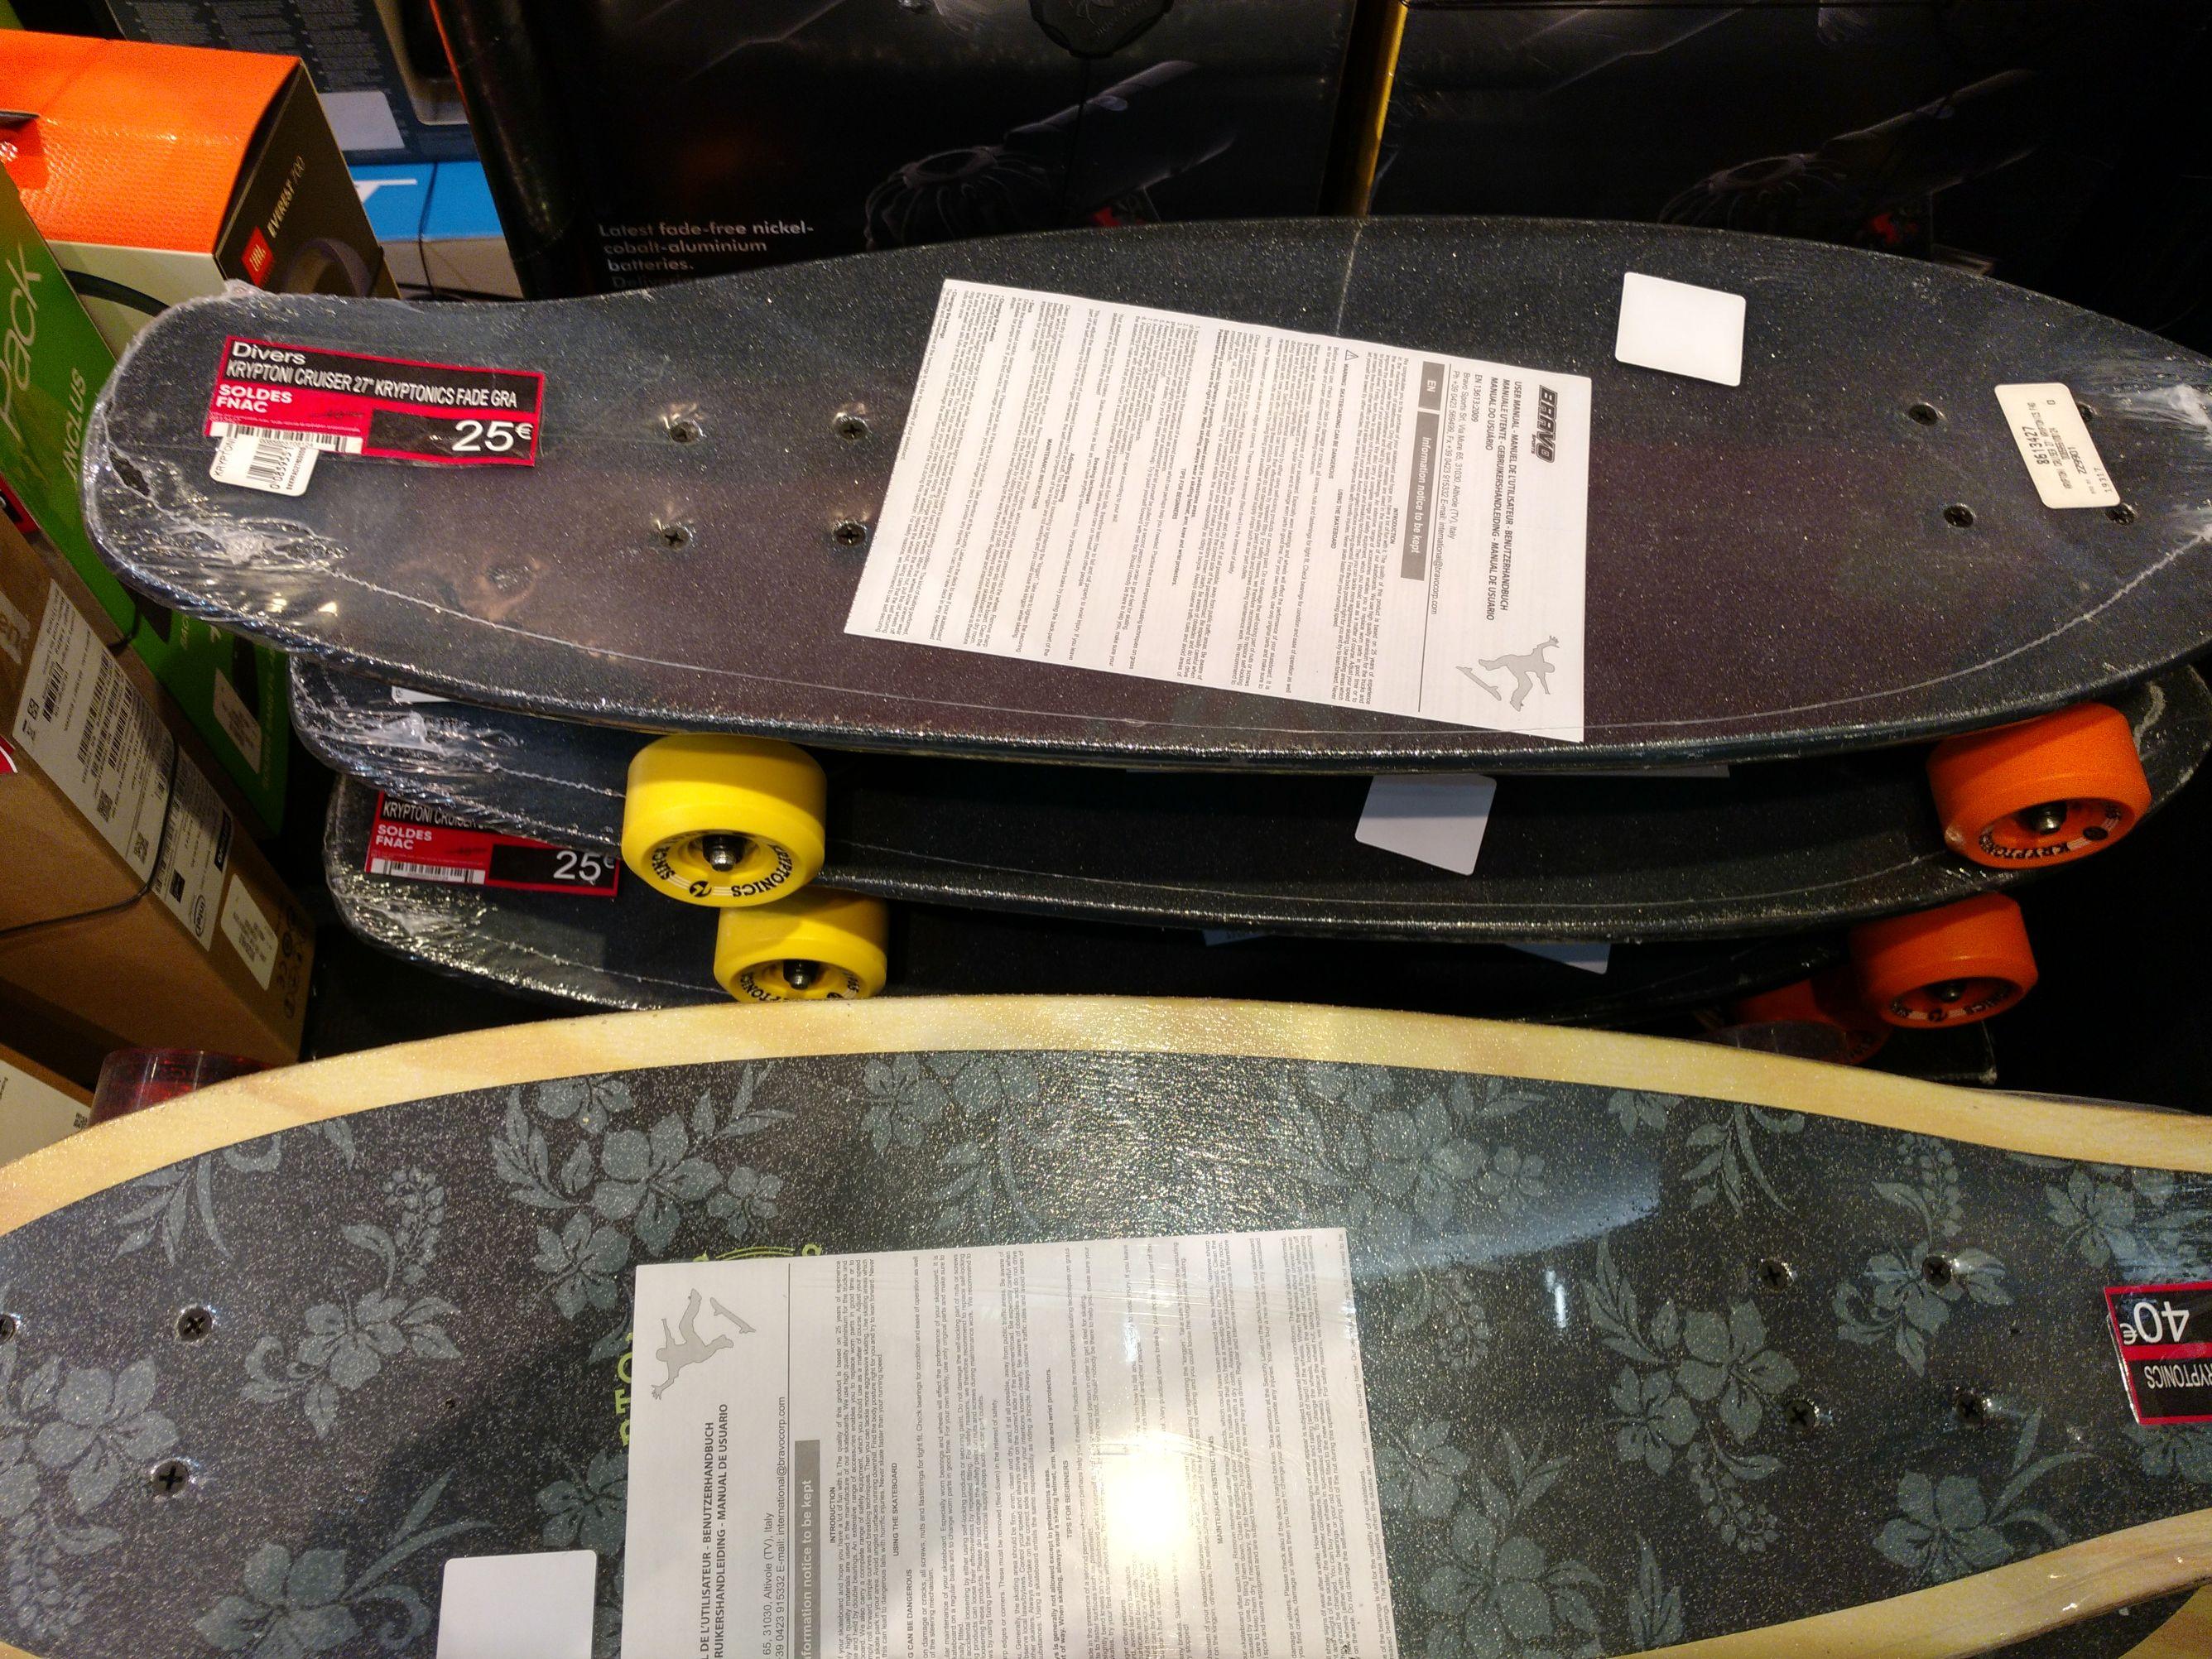 Sélection de skateboards, cruisers et longboards - Ex: Kryptonics Cruiser 27 - Avignon (84)